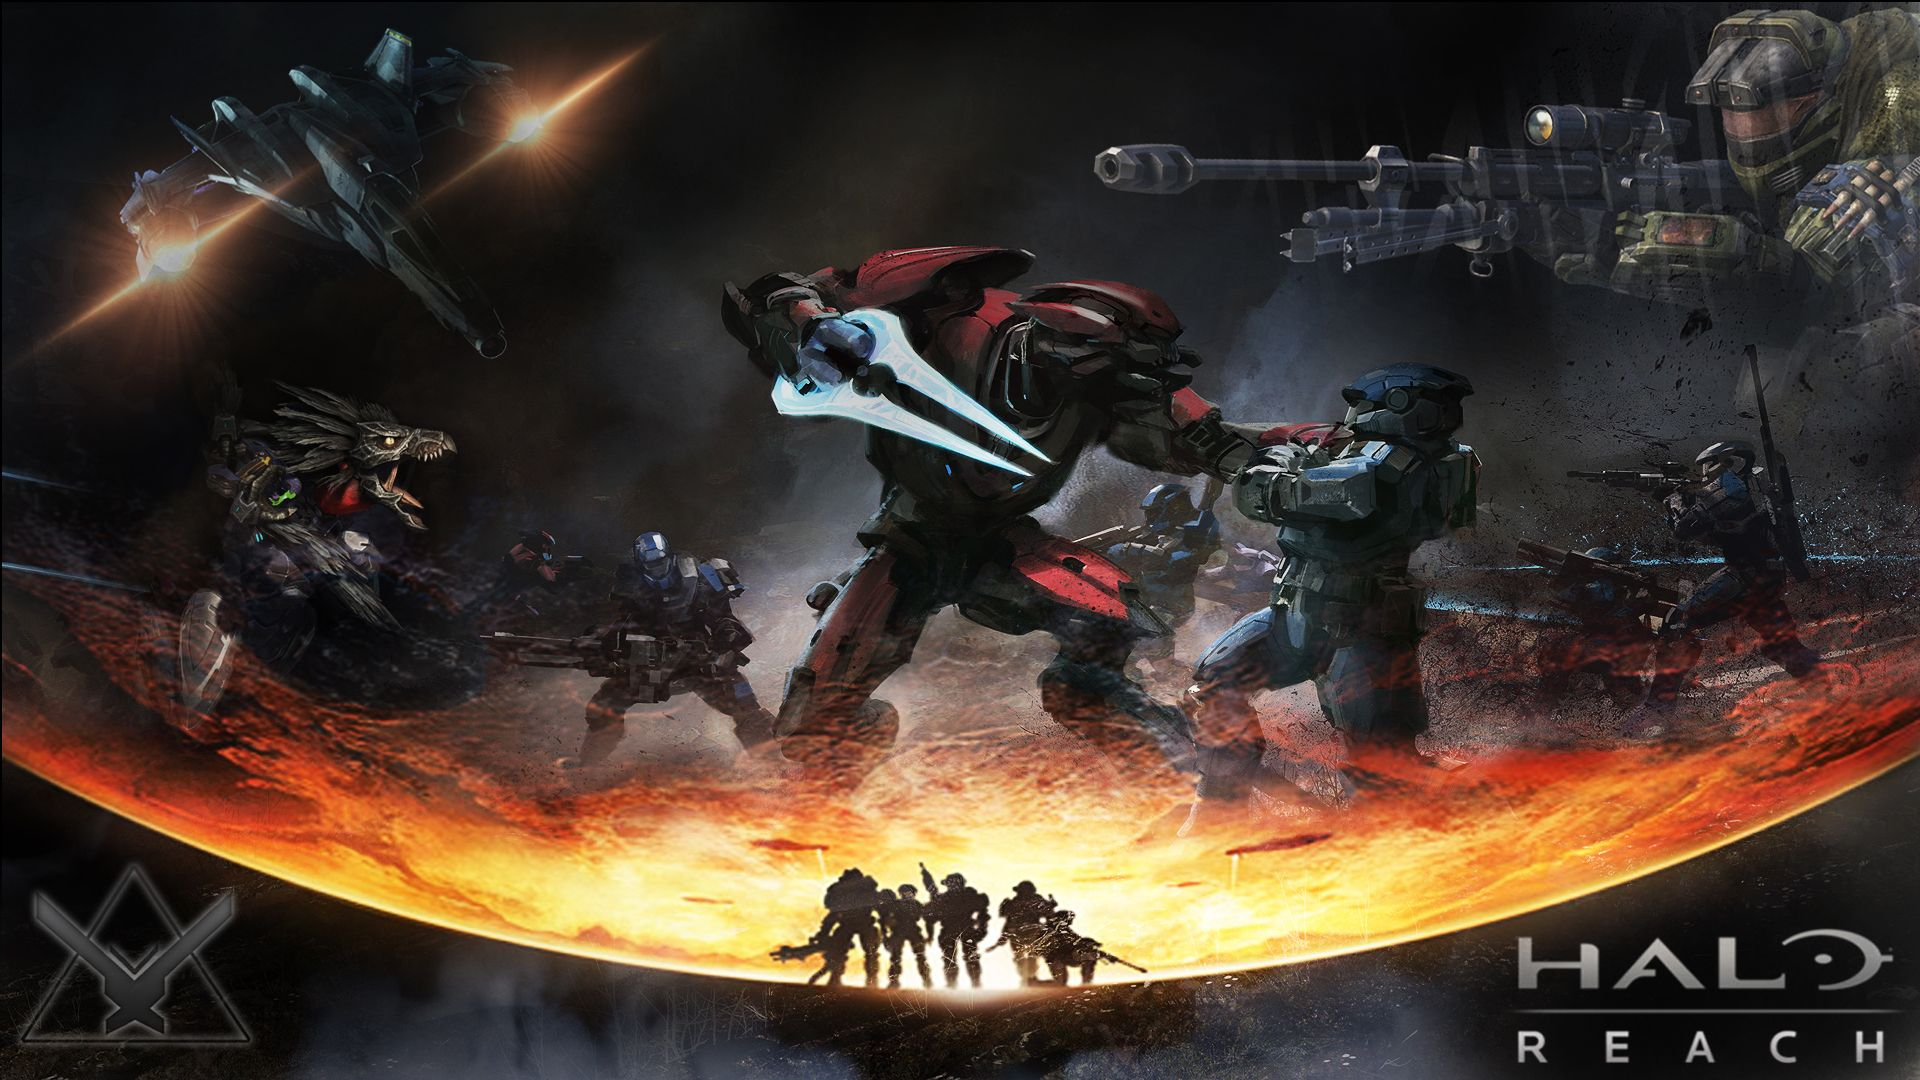 Epic Halo Reach Halo Reach Hd Wallpaper Cool Wallpaper